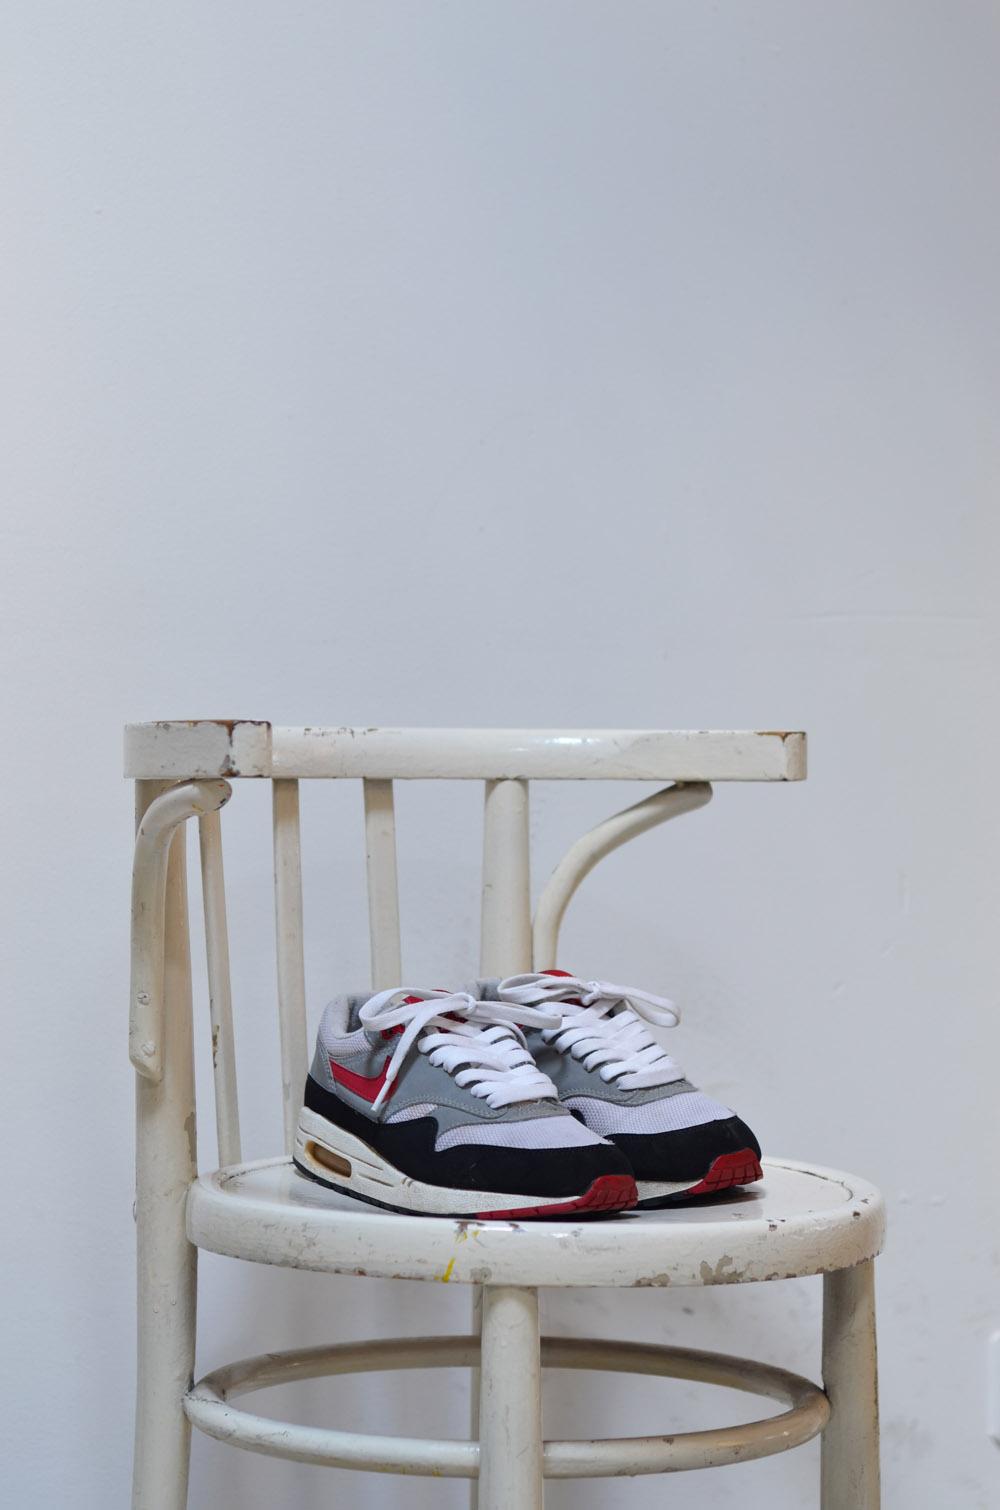 Nike air max 1 Chili